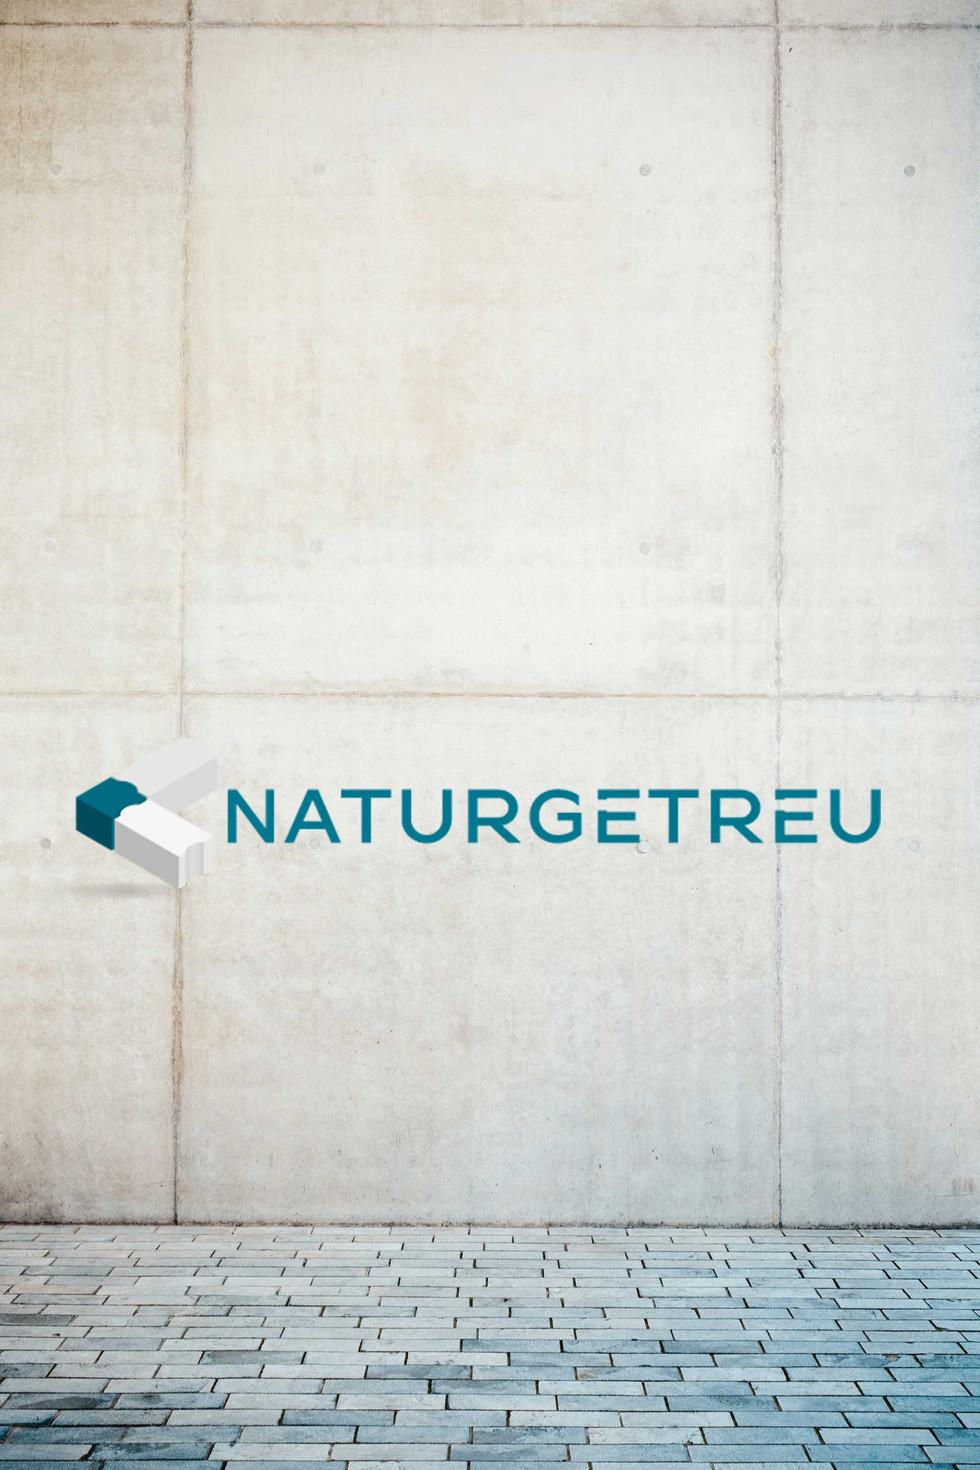 Logogestaltung Naturgetreu- Grafikdesign K